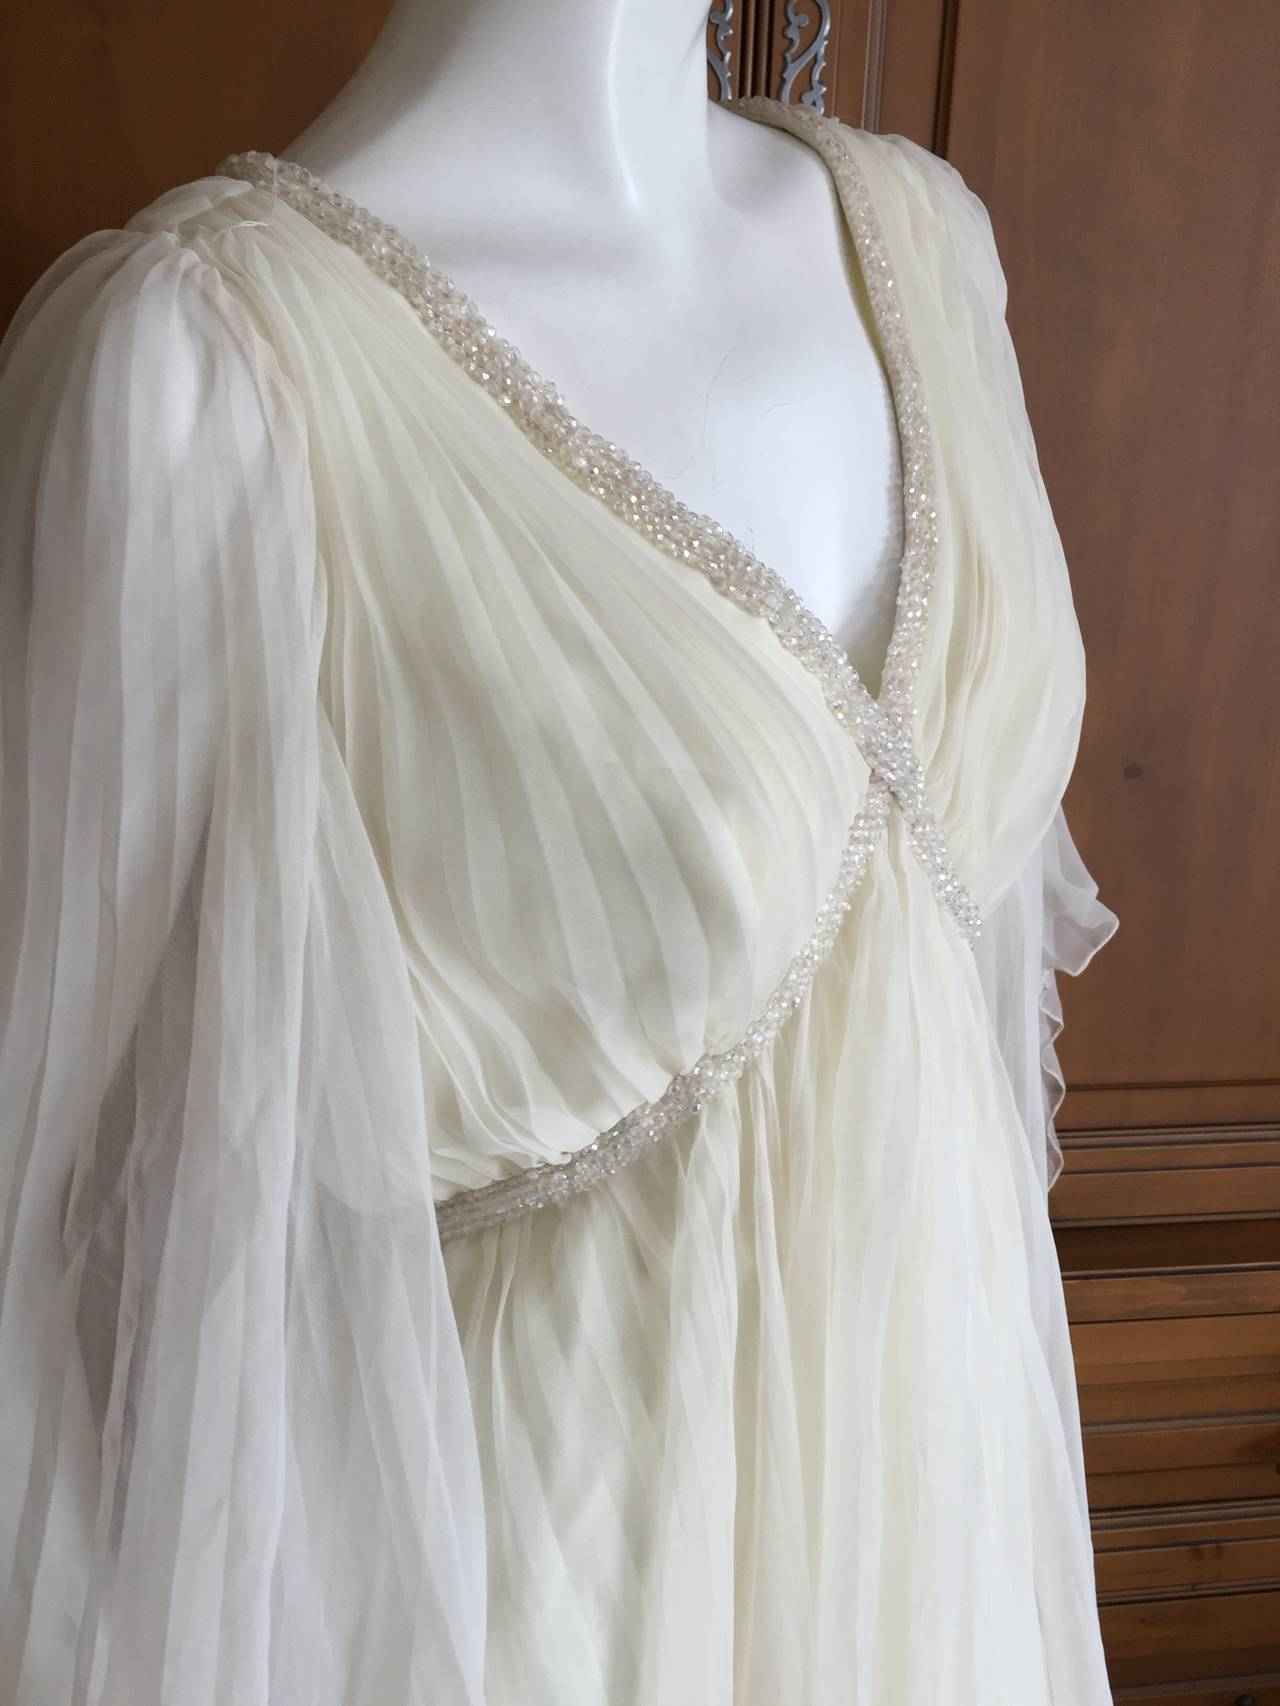 Jean Louis Romantic Ivory Beaded Dress 7